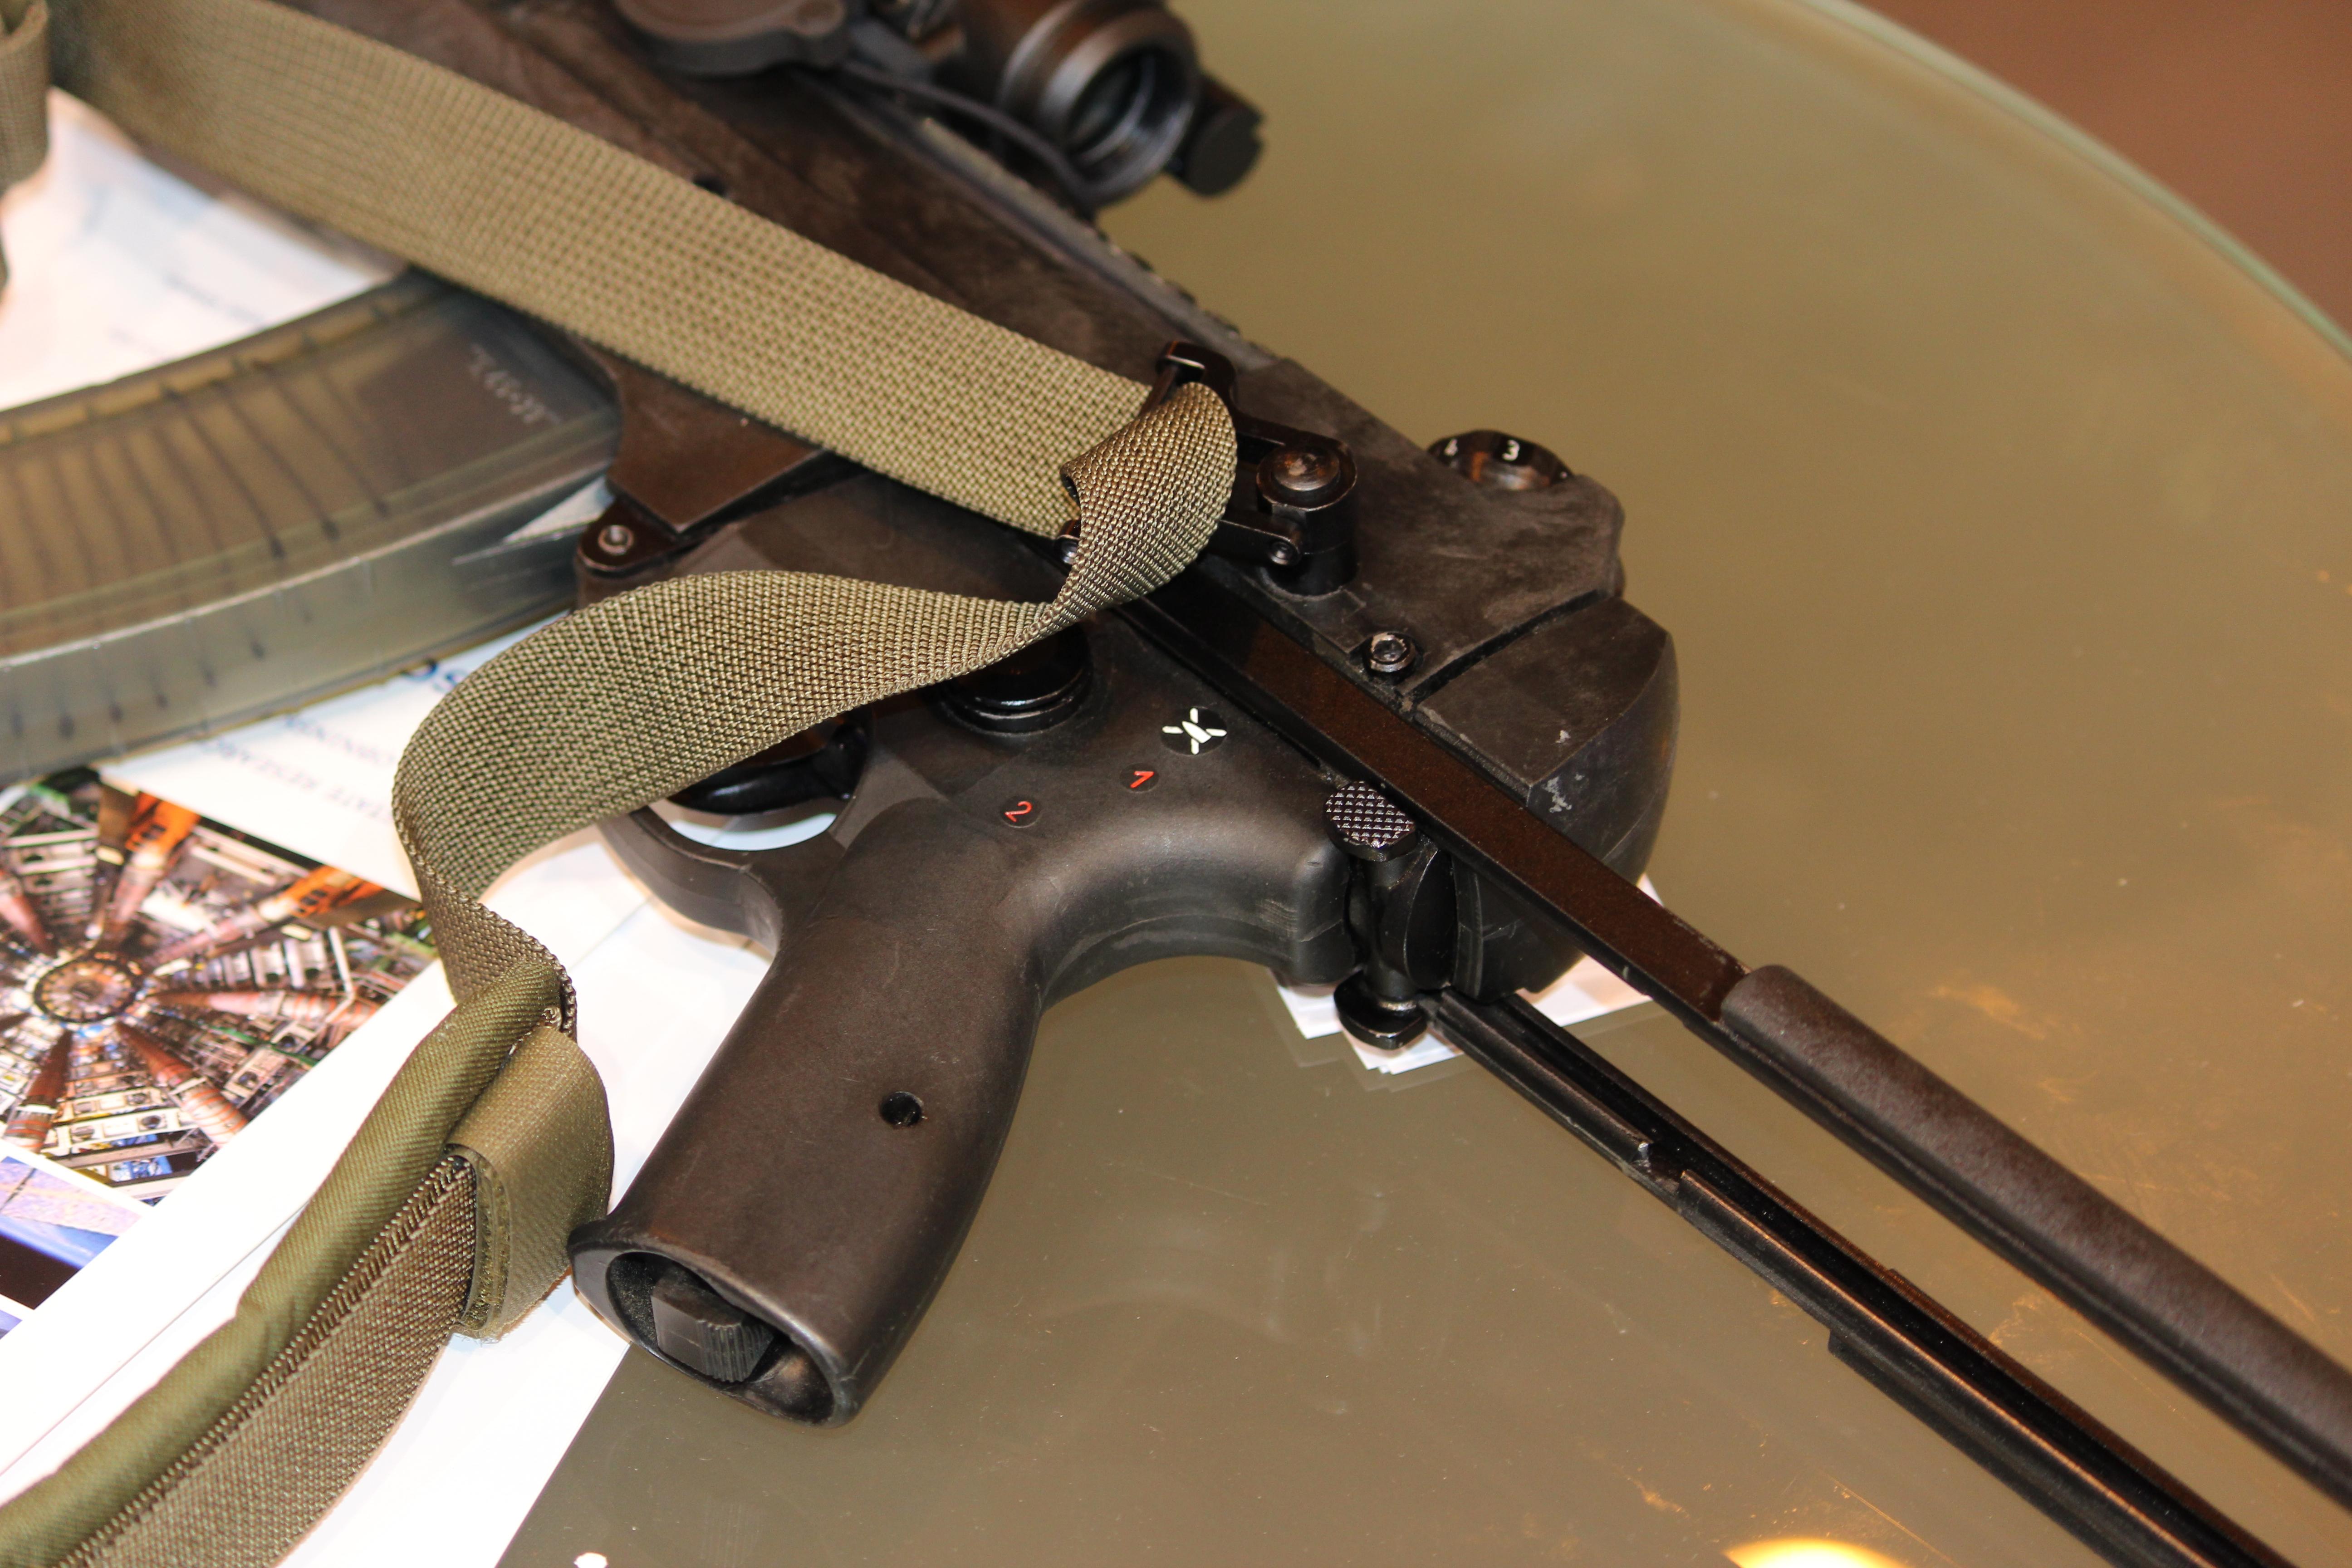 Russian Assault Rifles & Machine Guns Thread: #1 - Page 26 RJA5z